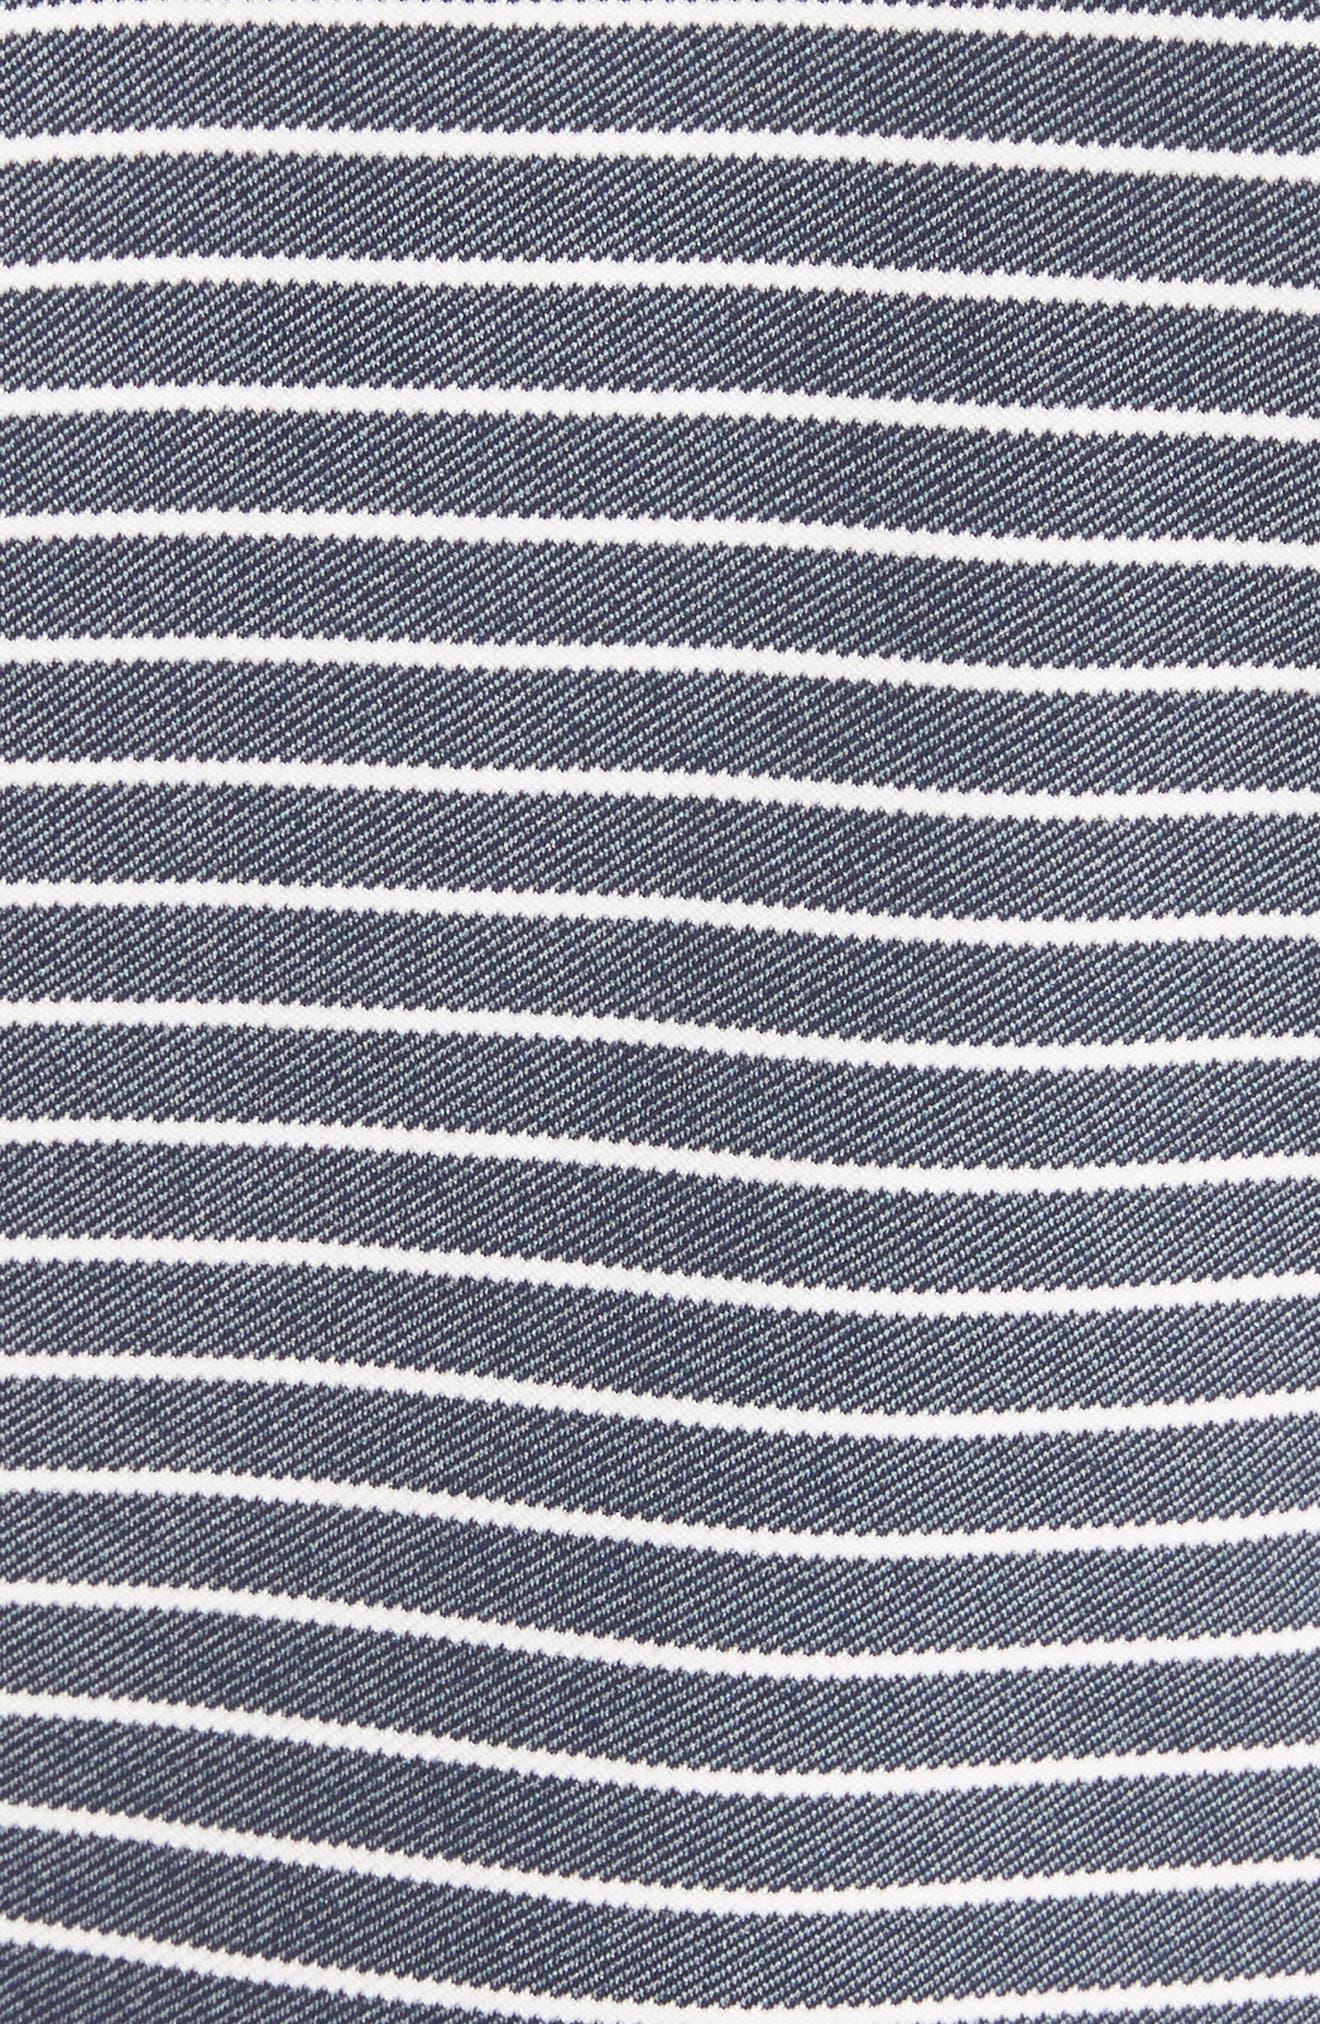 Julius Stripe Denim Twill Jacket,                             Alternate thumbnail 5, color,                             Indigo Multi